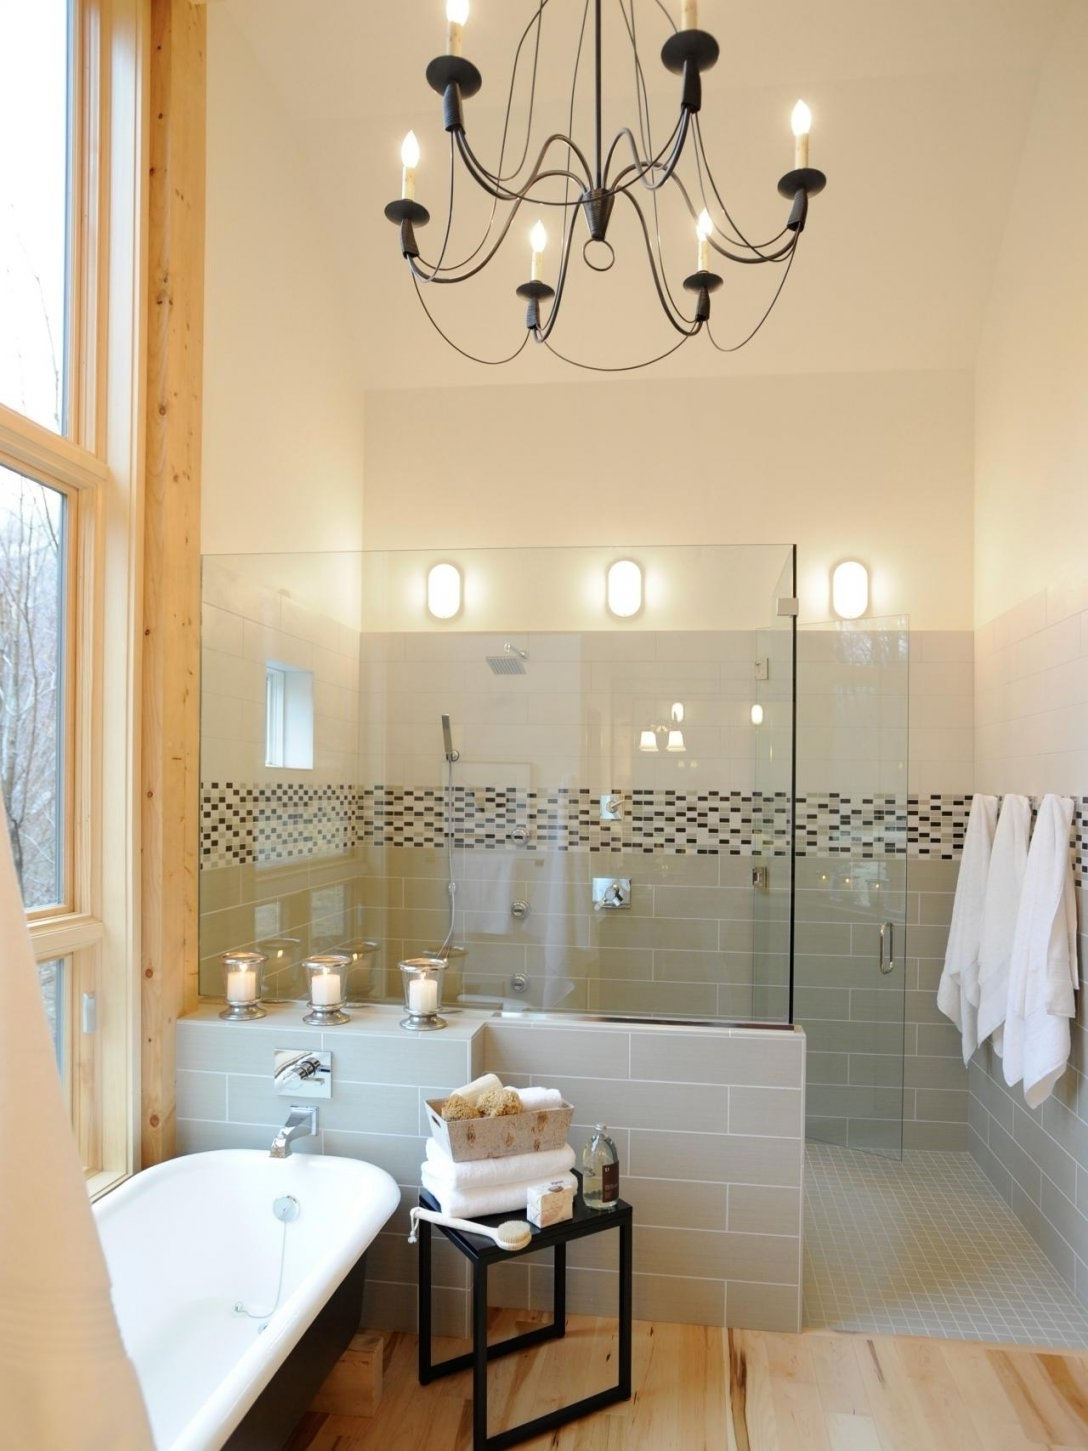 Popular Mini Chandelier Bathroom Lighting Intended For Mini Chandelier Bathroom Lighting (View 20 of 20)